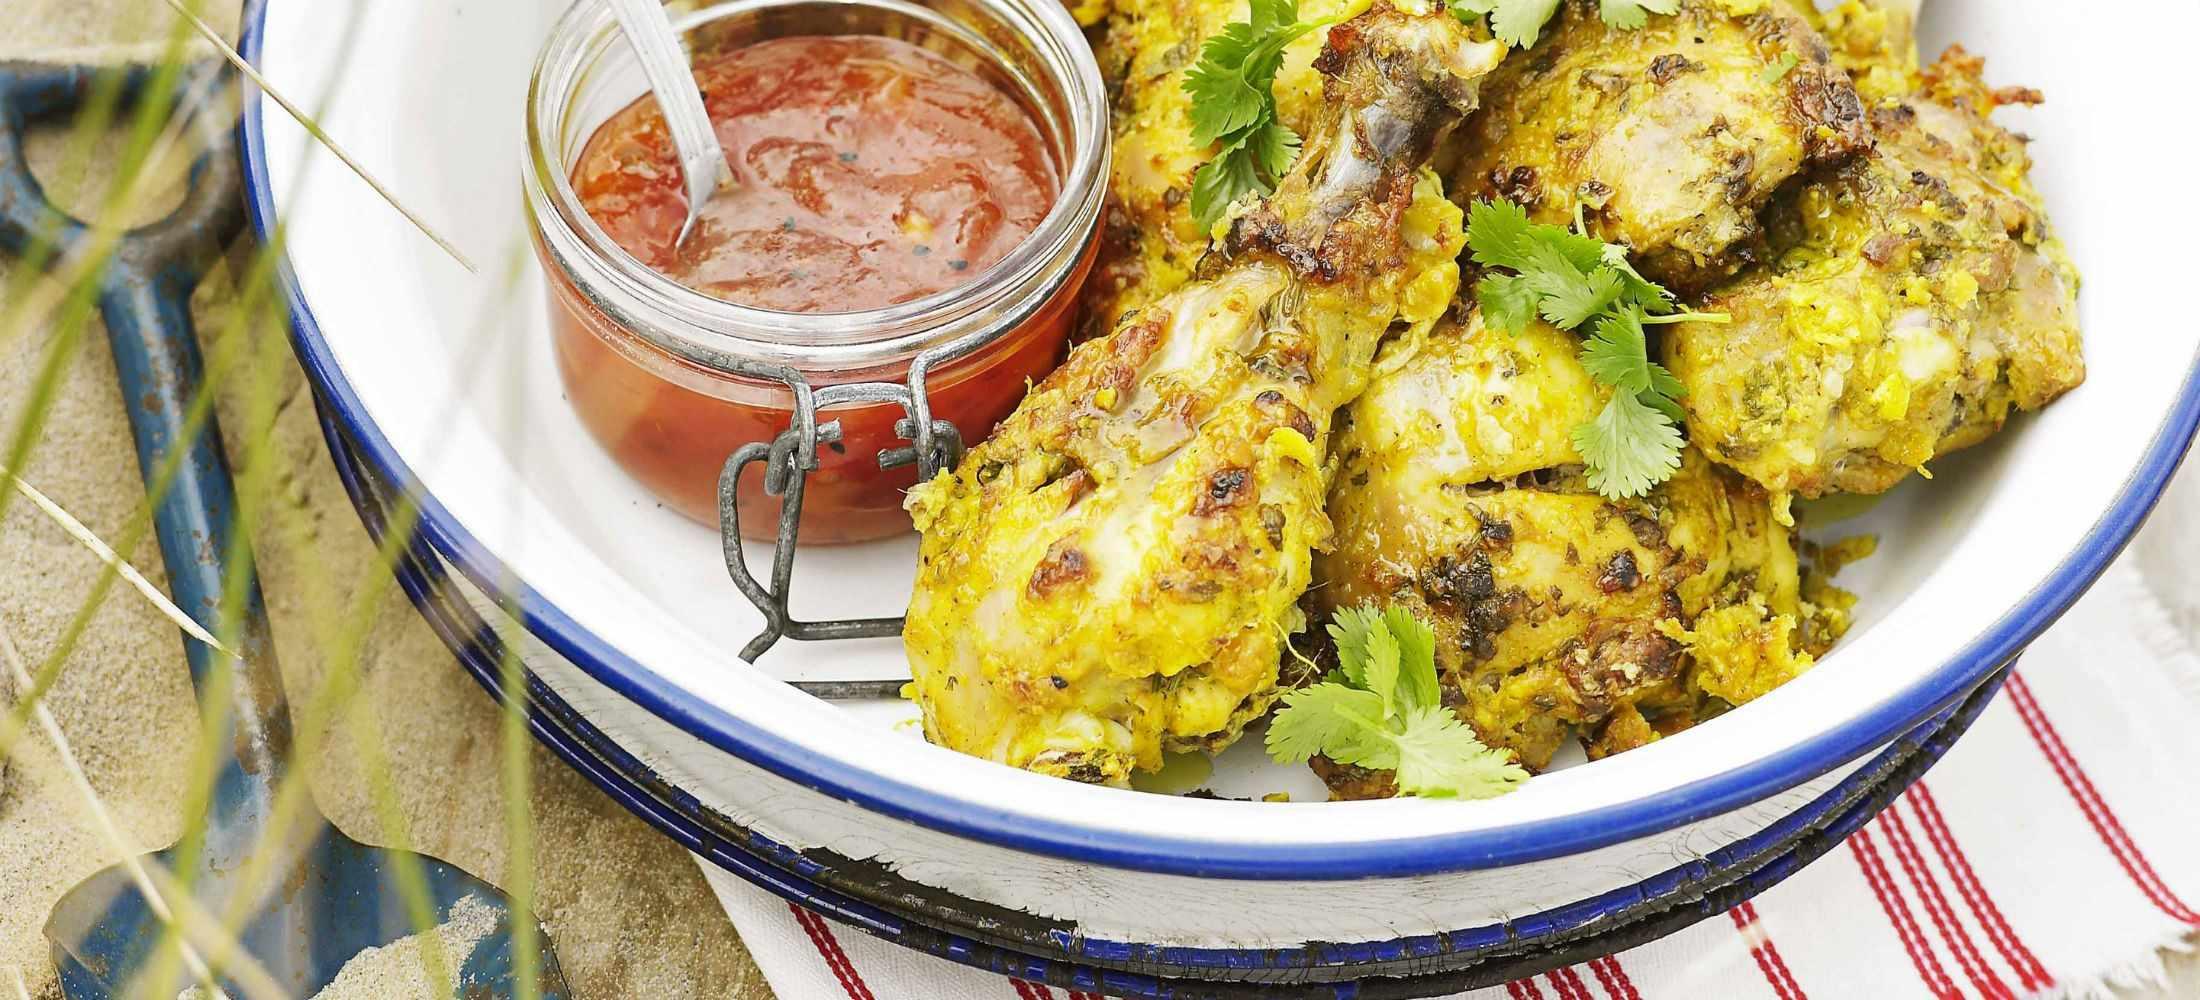 Satay chicken